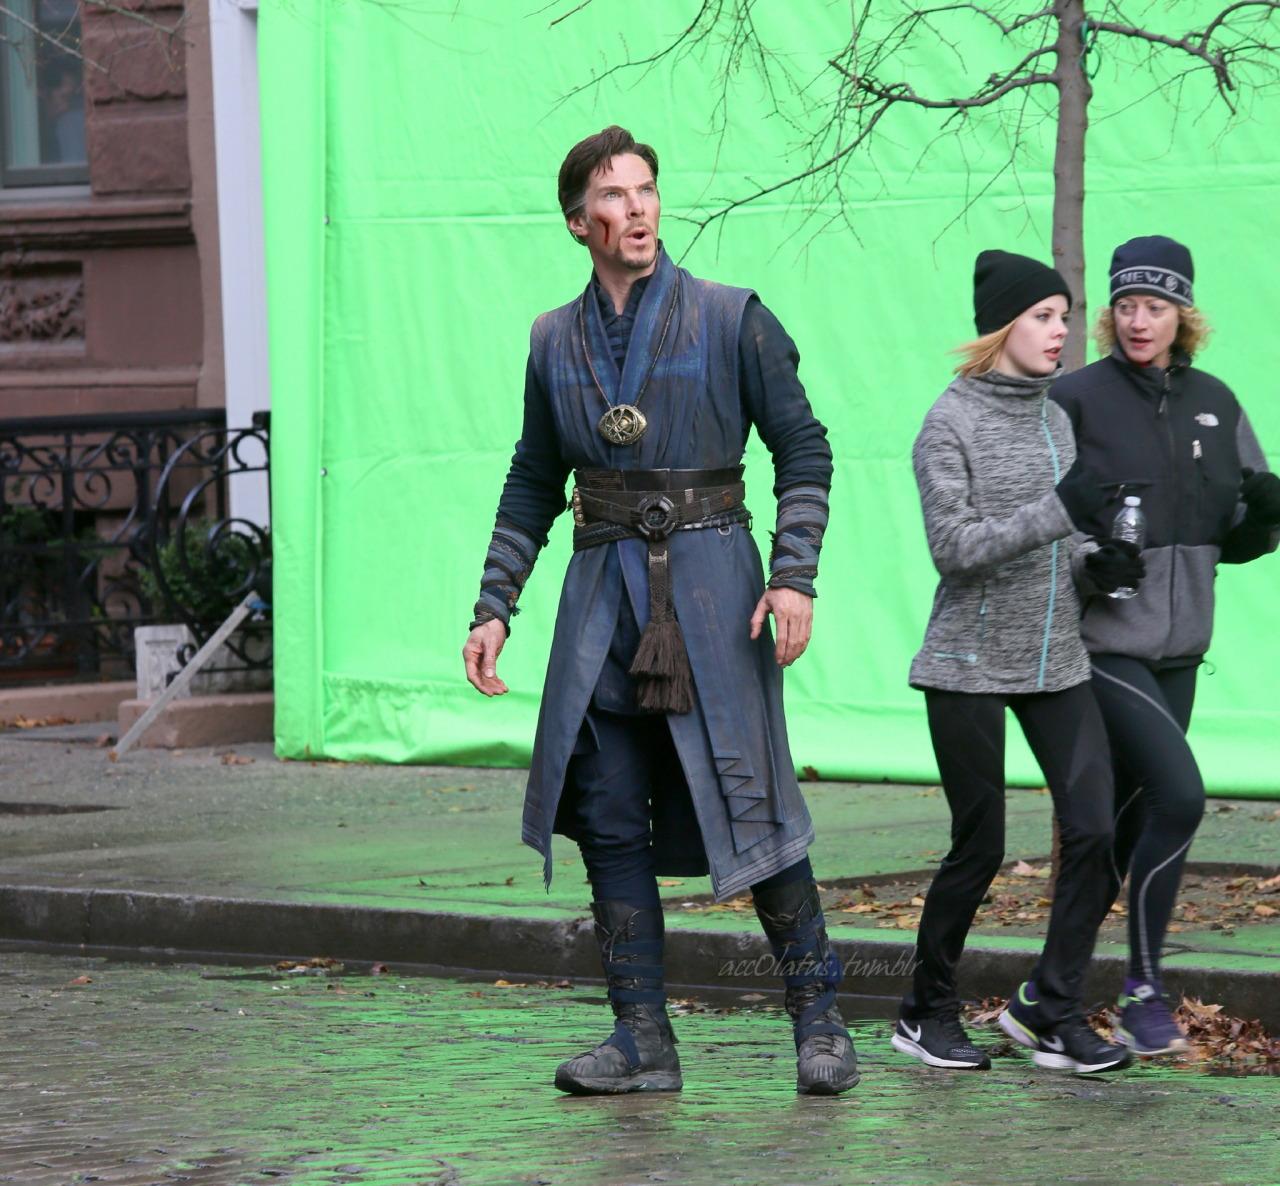 Doctor Symbol Hd Wallpaper Benedict Cumberbatch Loses The Cloak In More Doctor